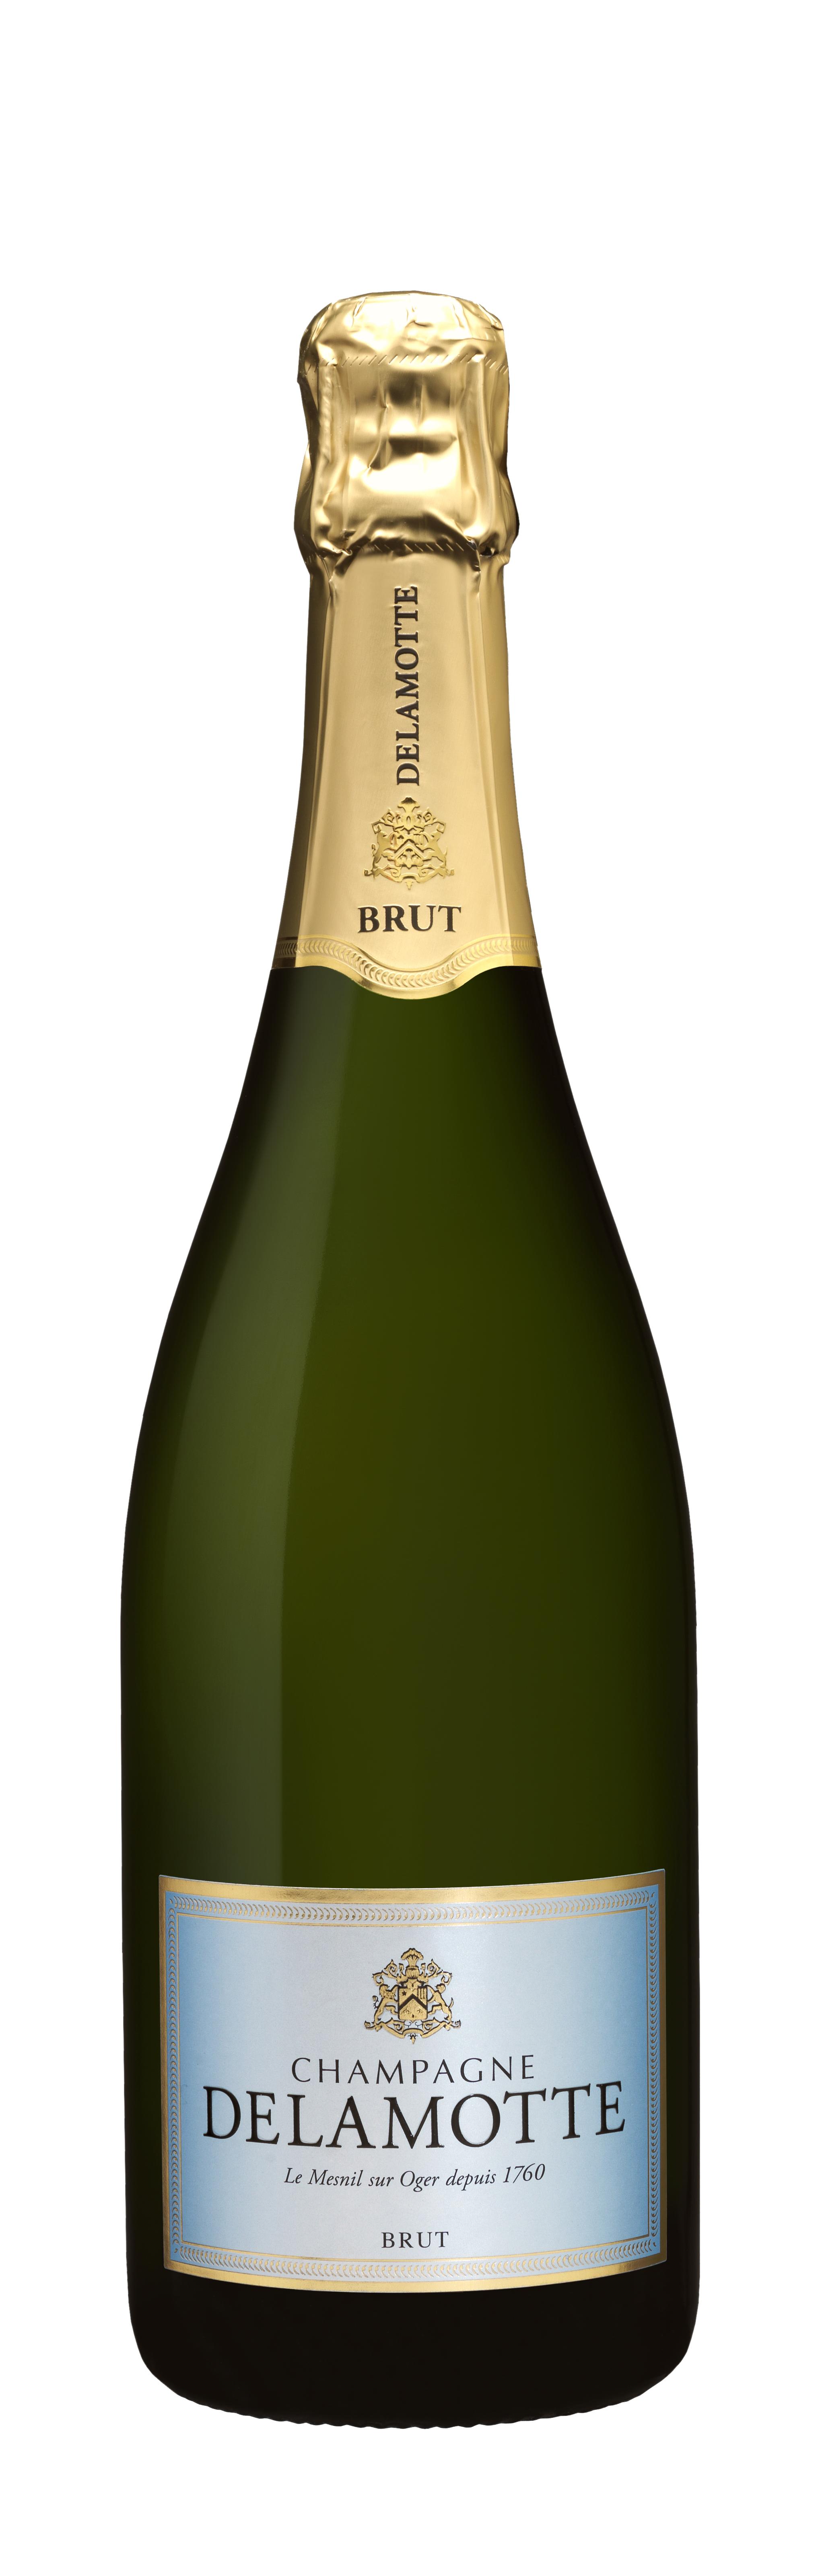 Champagne Delamotte Brut Bottle.jpg